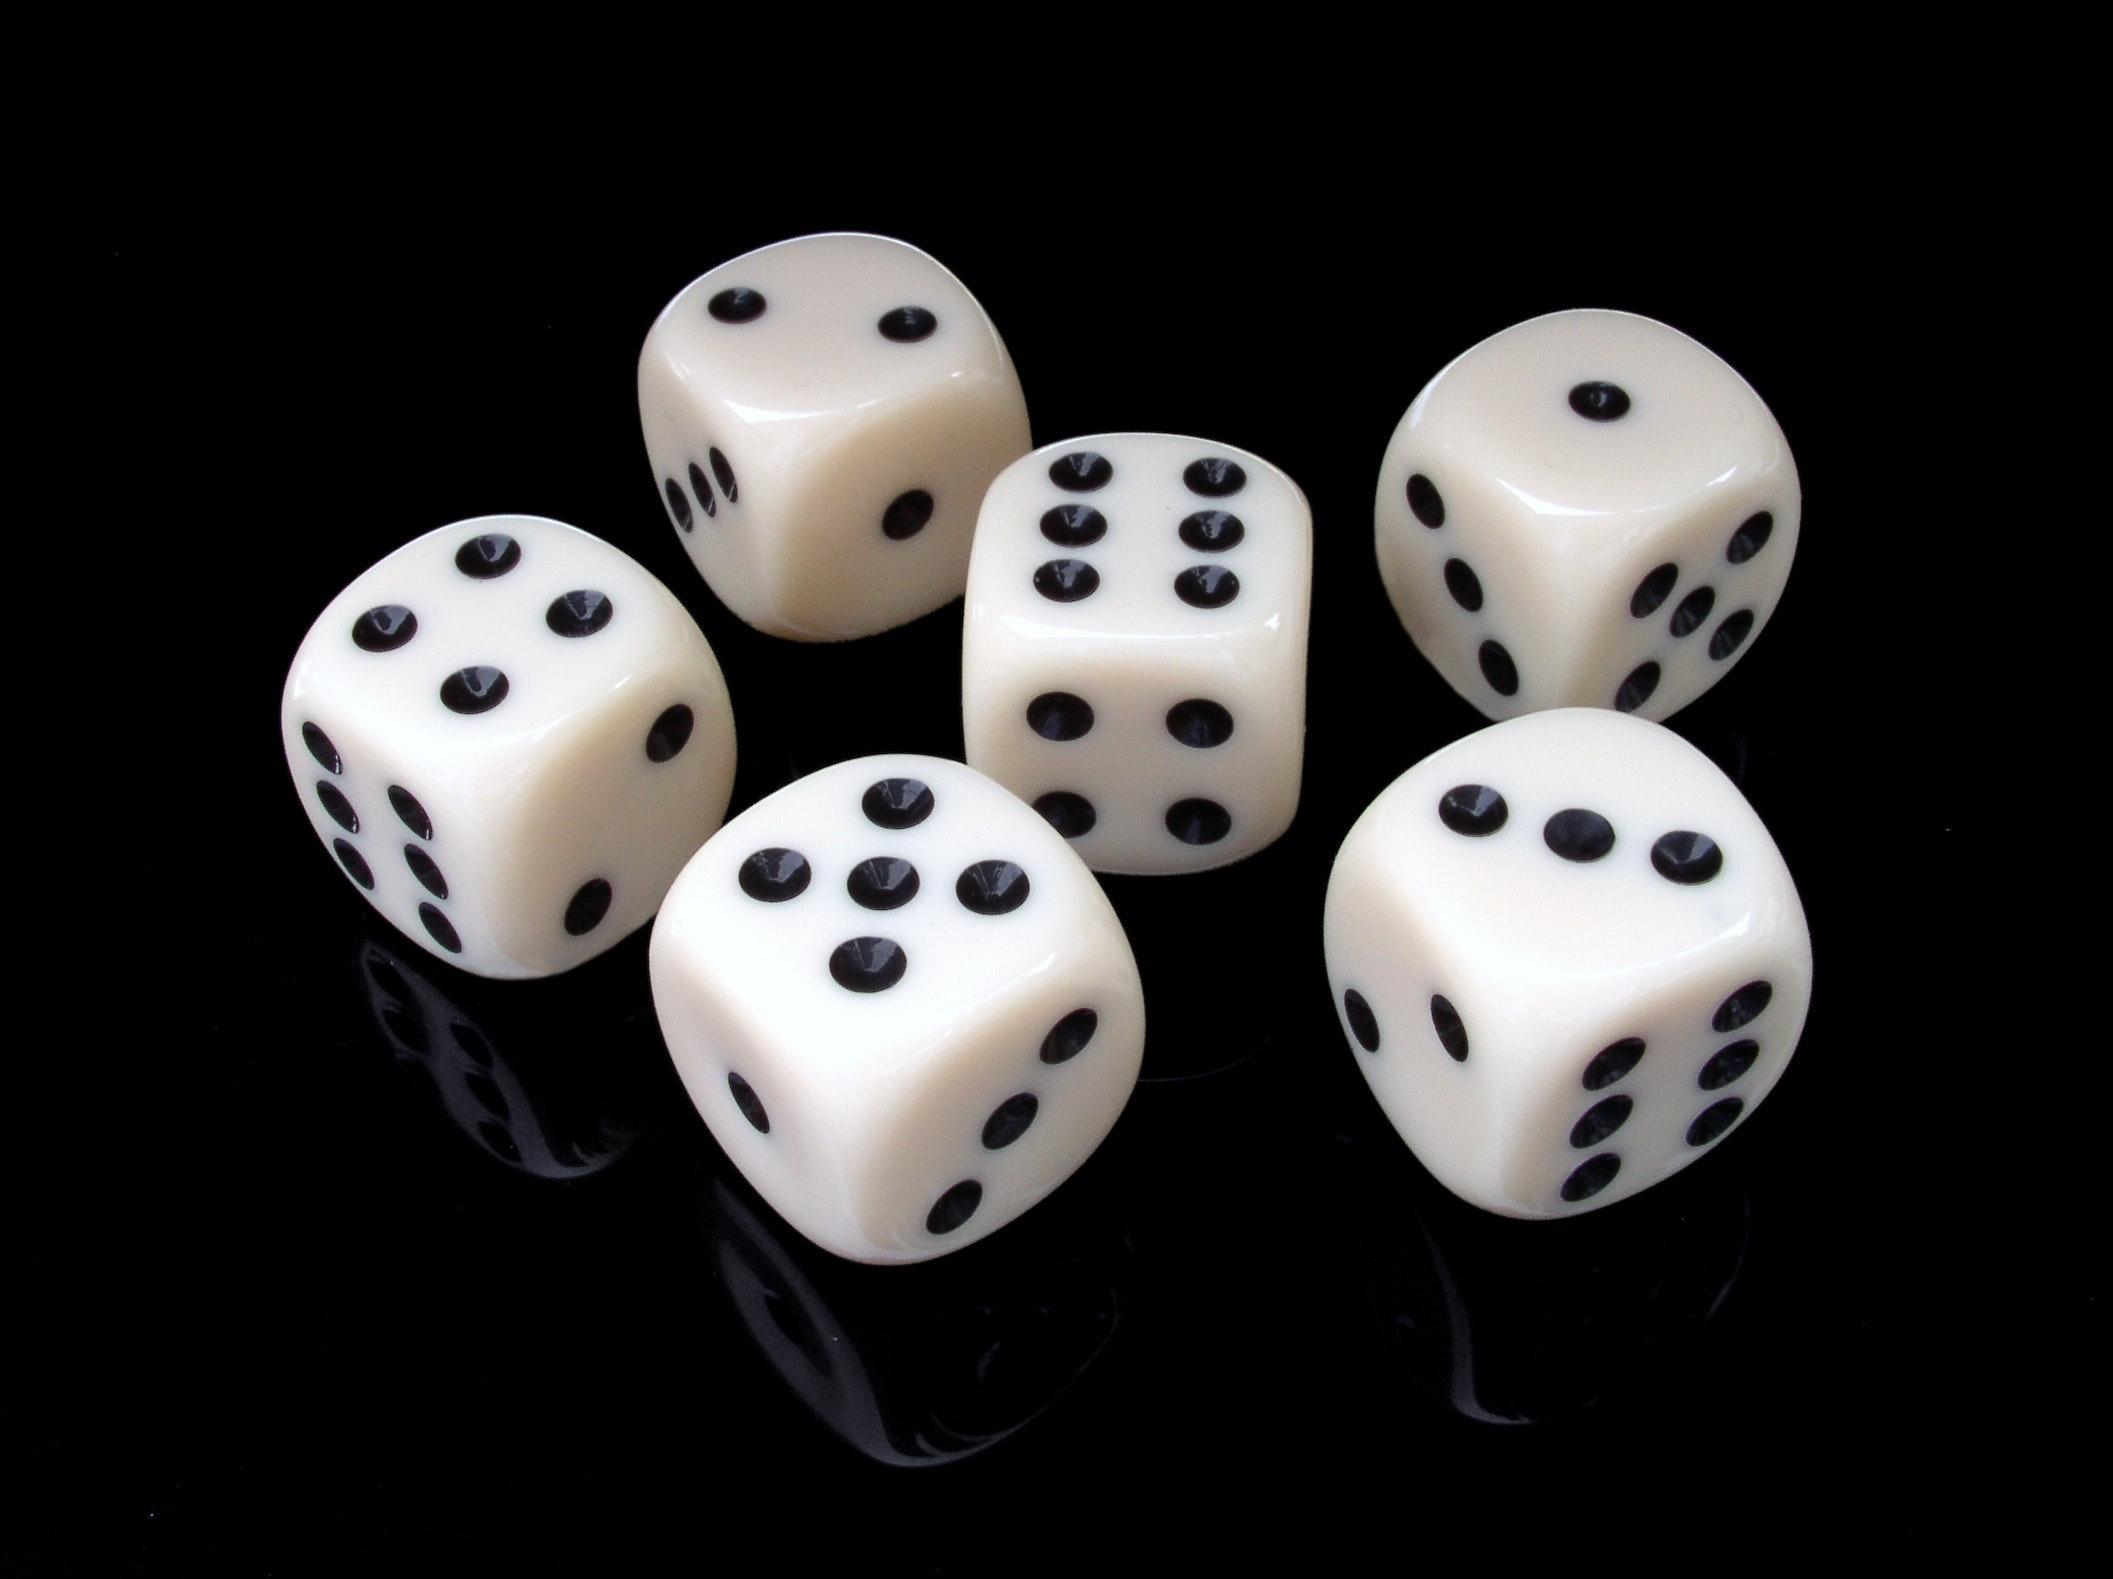 black-black-and-white-cubes-37534.jpg